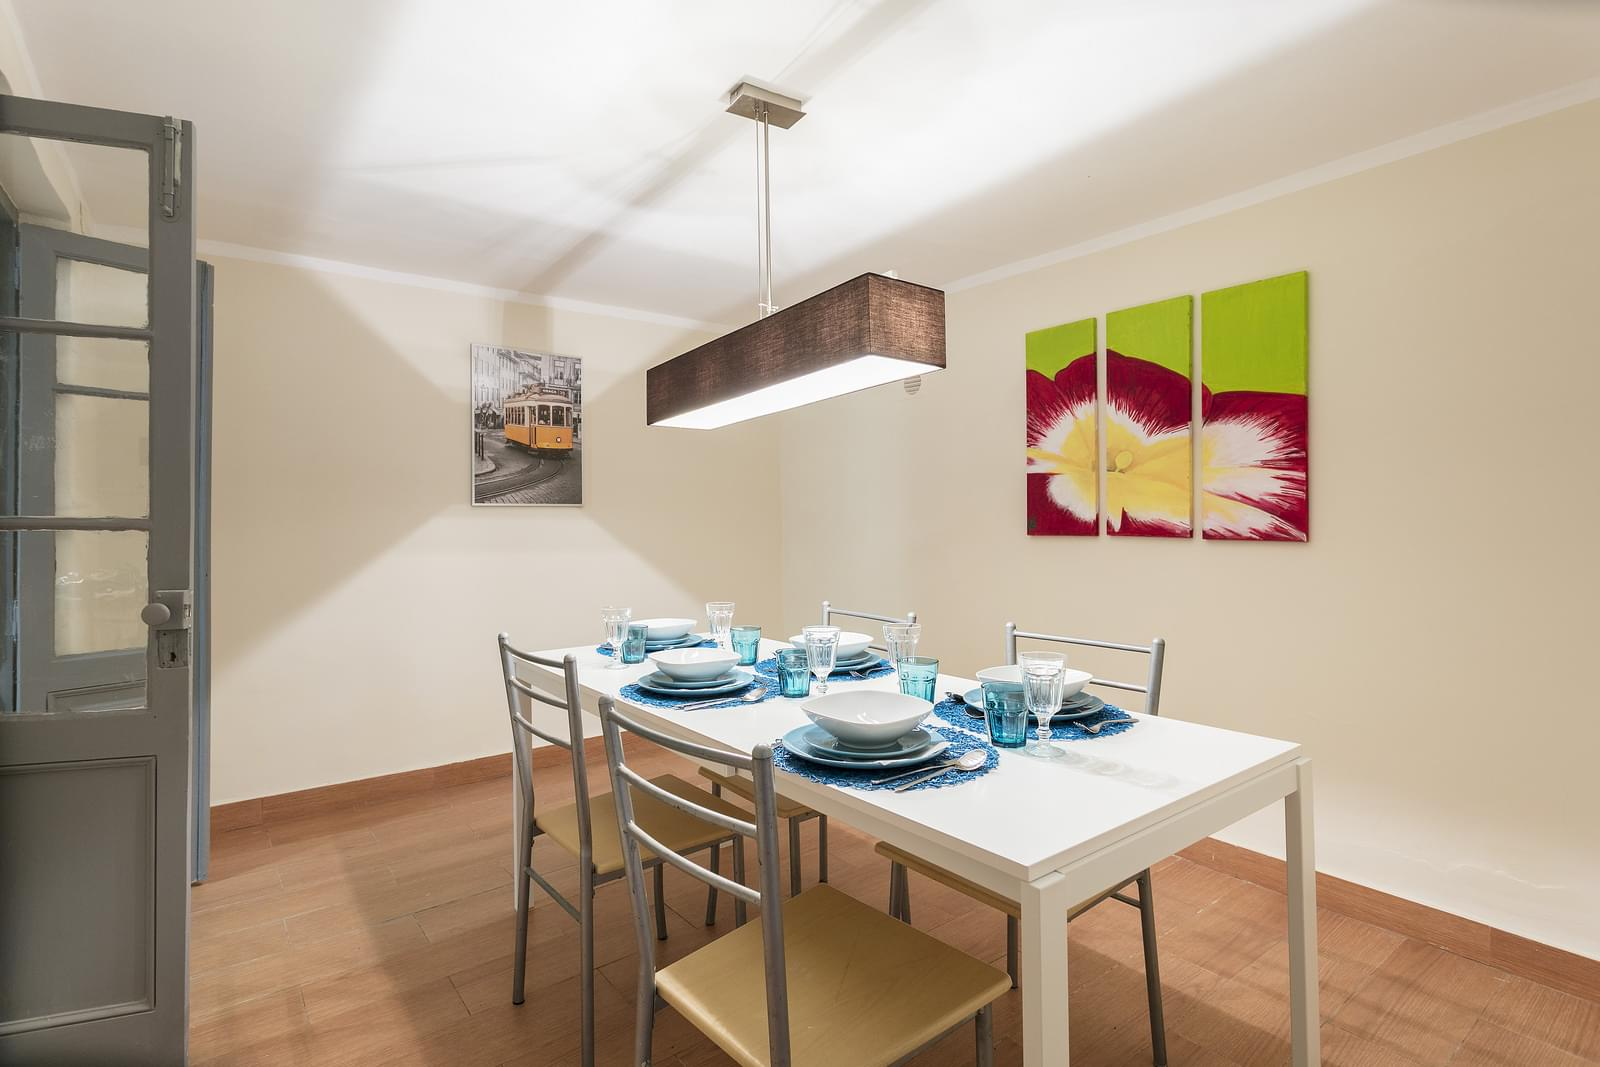 pf16716-apartamento-t2-3-lisboa-21a23614-eb19-4f33-8dcd-fee58137de78